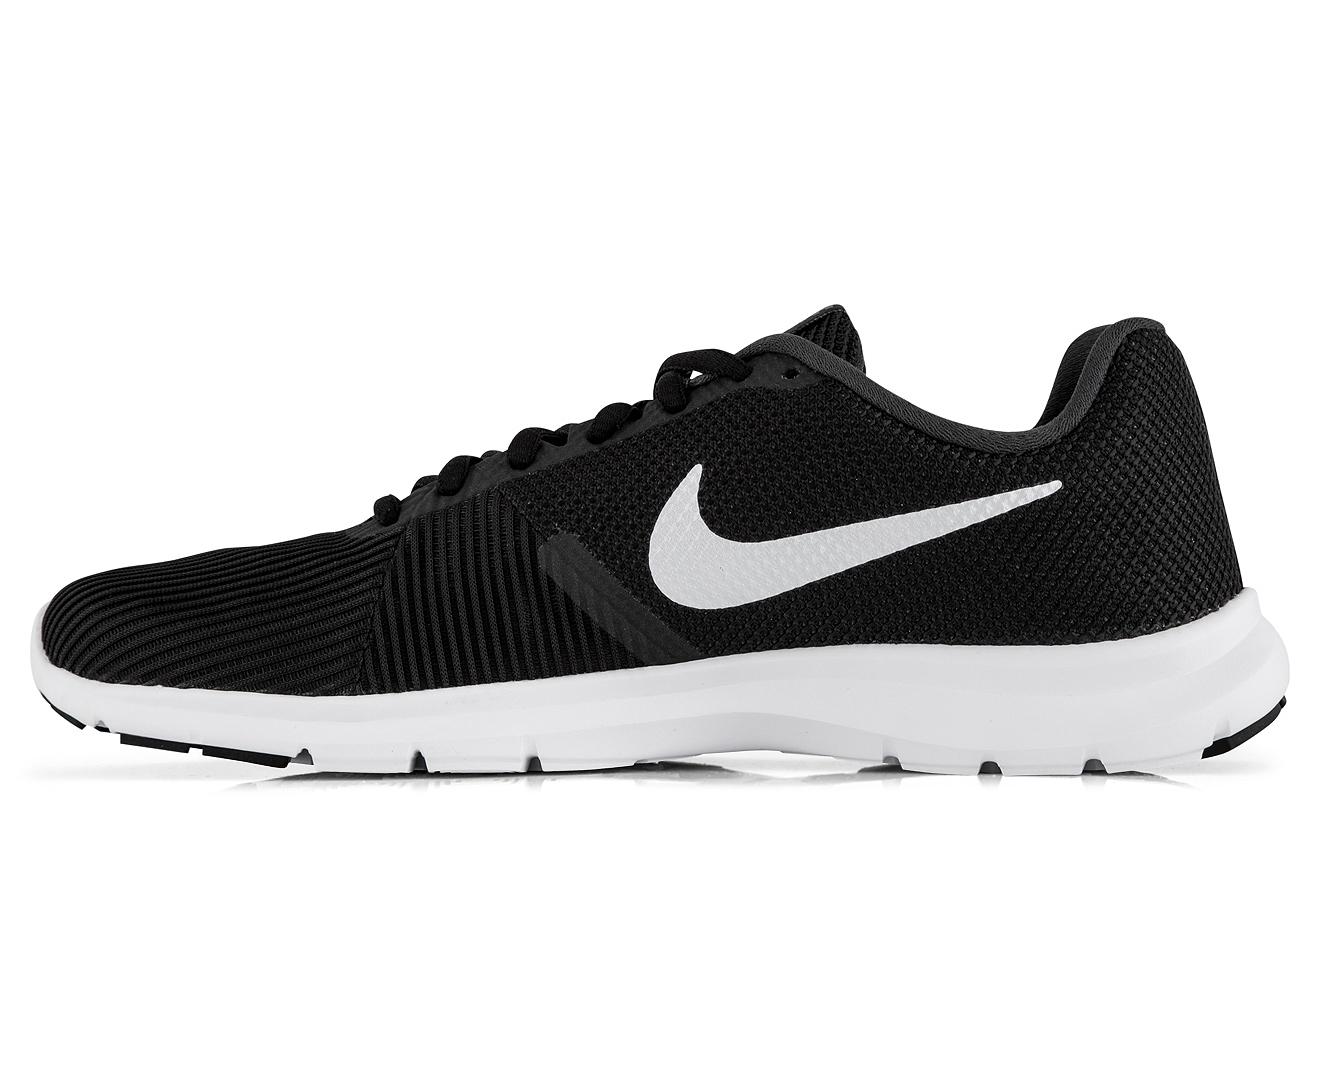 48eb0fc68088 Nike Women s Flex Bijoux Shoe - Black White Anthracite